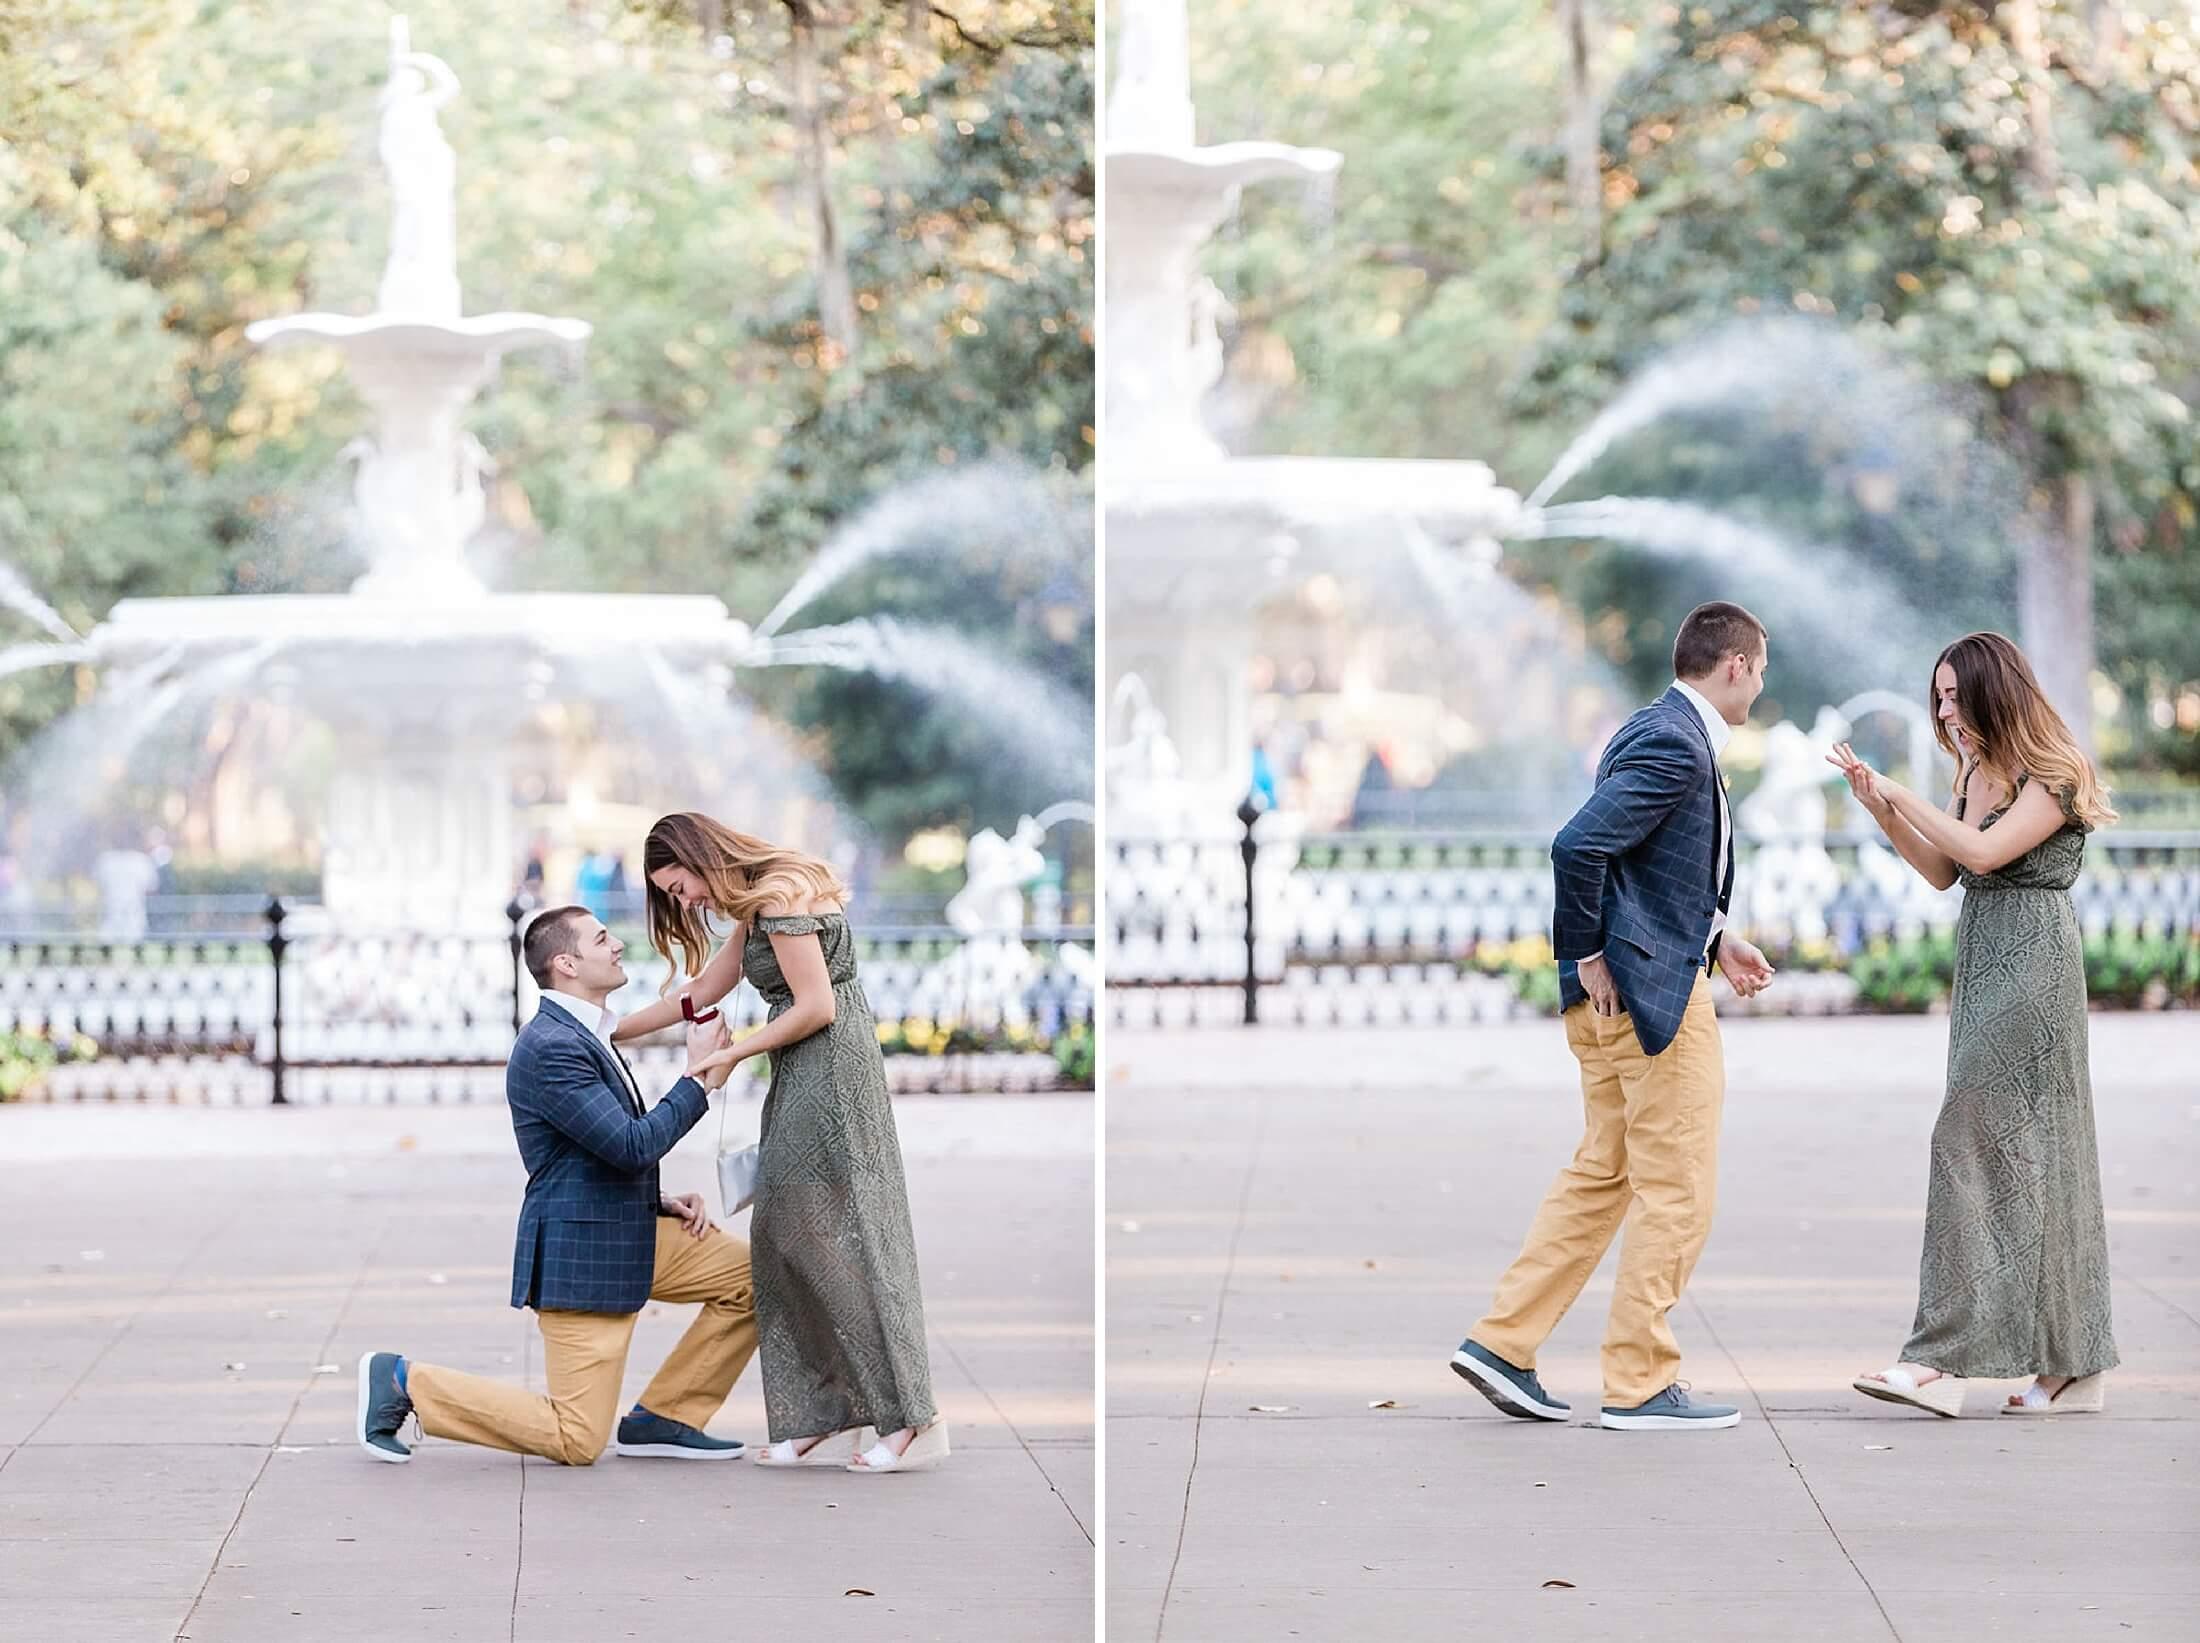 Apt-b-photography-savannah-proposal-photographer-savannah-wedding-forsyth-fountain-proposal-001.jpg